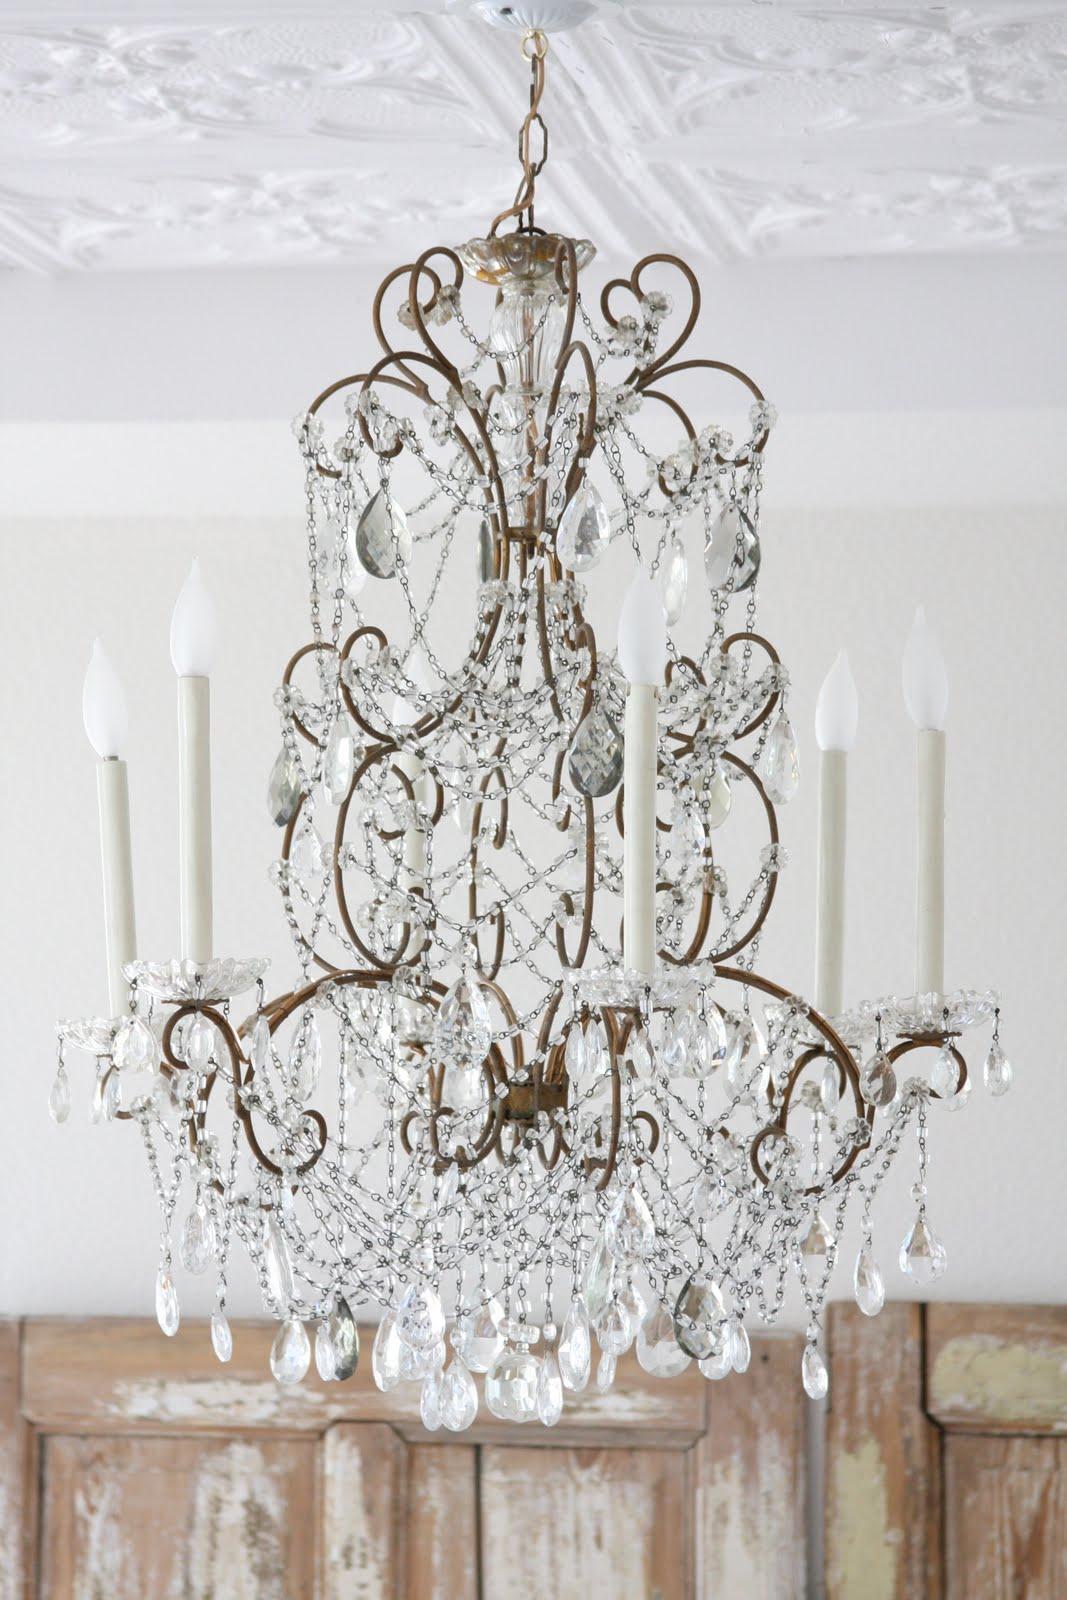 Prairie perch my top 5 chandeliers image sources 134 dreamy whites 2 pinterest arubaitofo Gallery